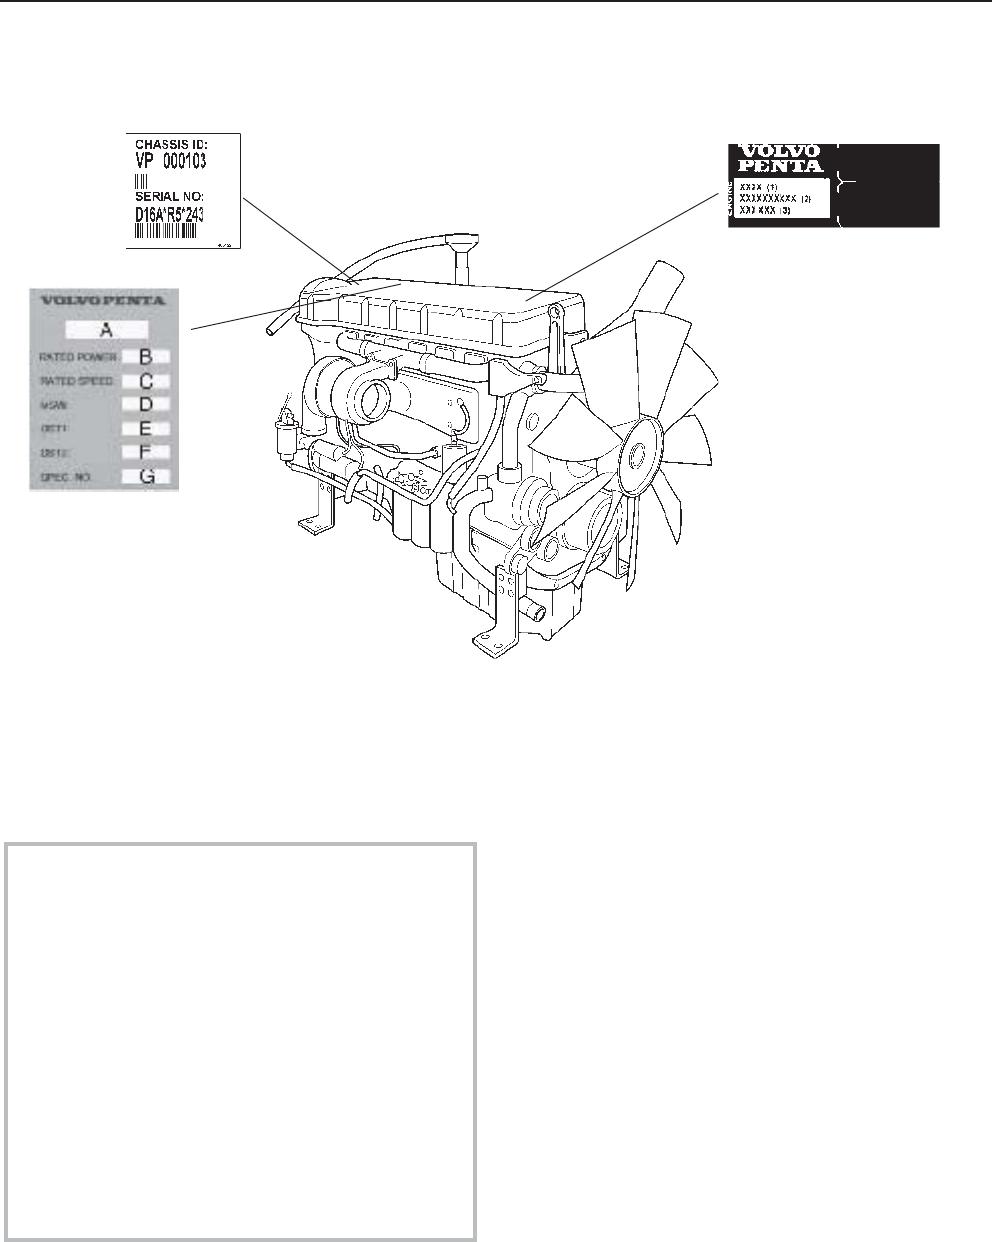 Electrical Diagram Ems2 Bookmark About Wiring Volvo Symbols Penta Data Rh 13 12 10 Mercedes Aktion Tesmer De Ladder